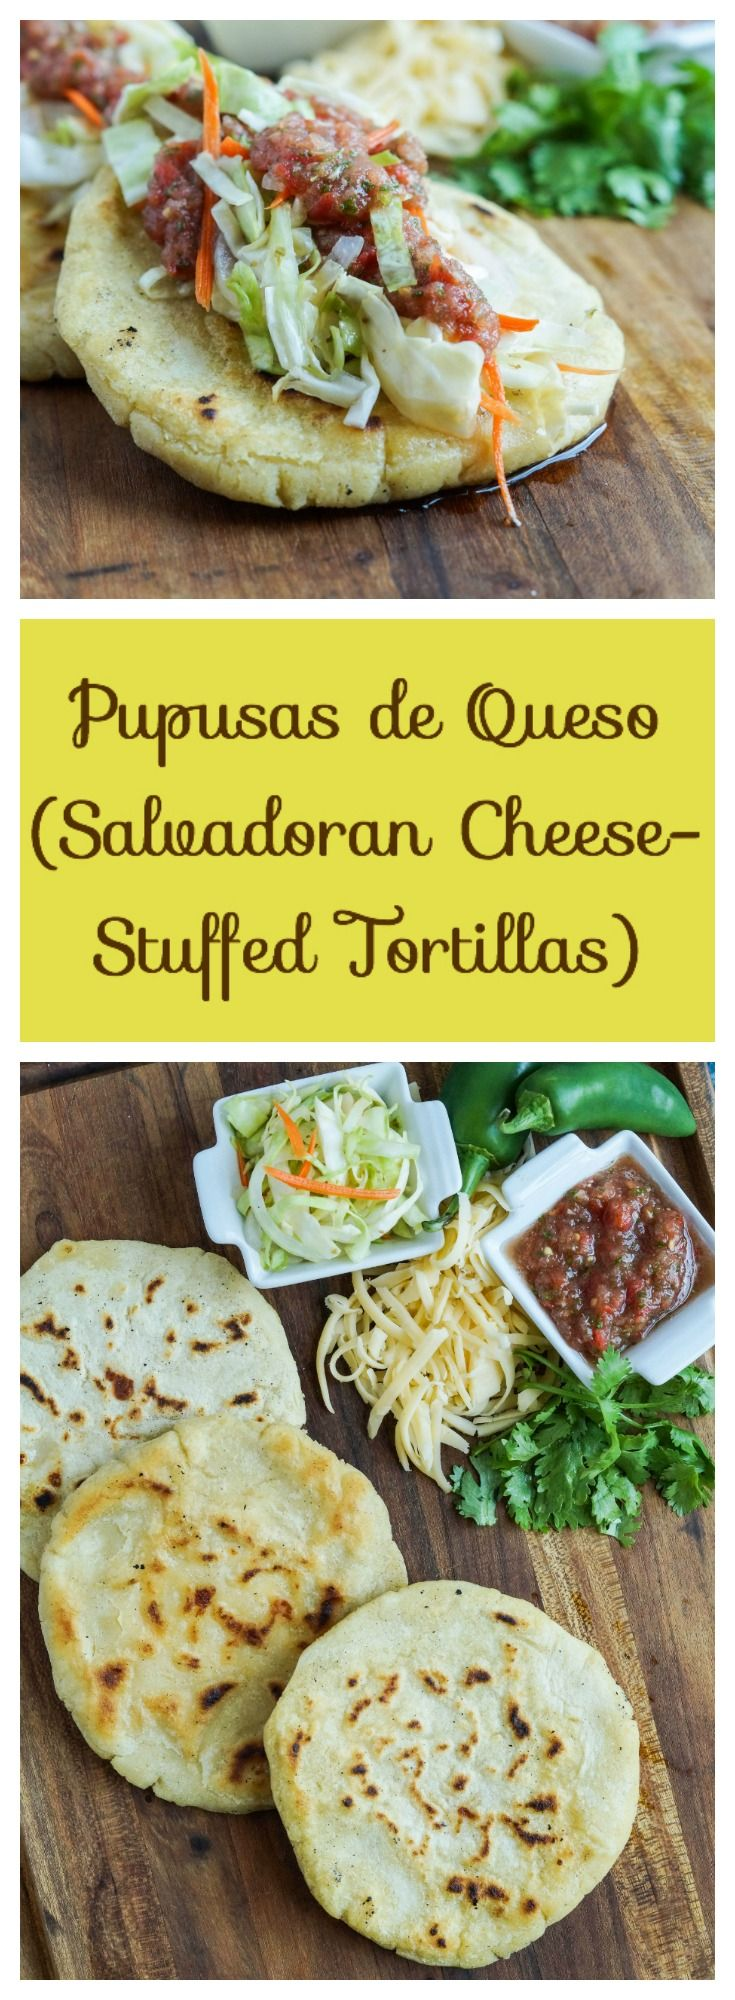 pupusas-de-queso-salvadoran-cheese-stuffed-tortillas1